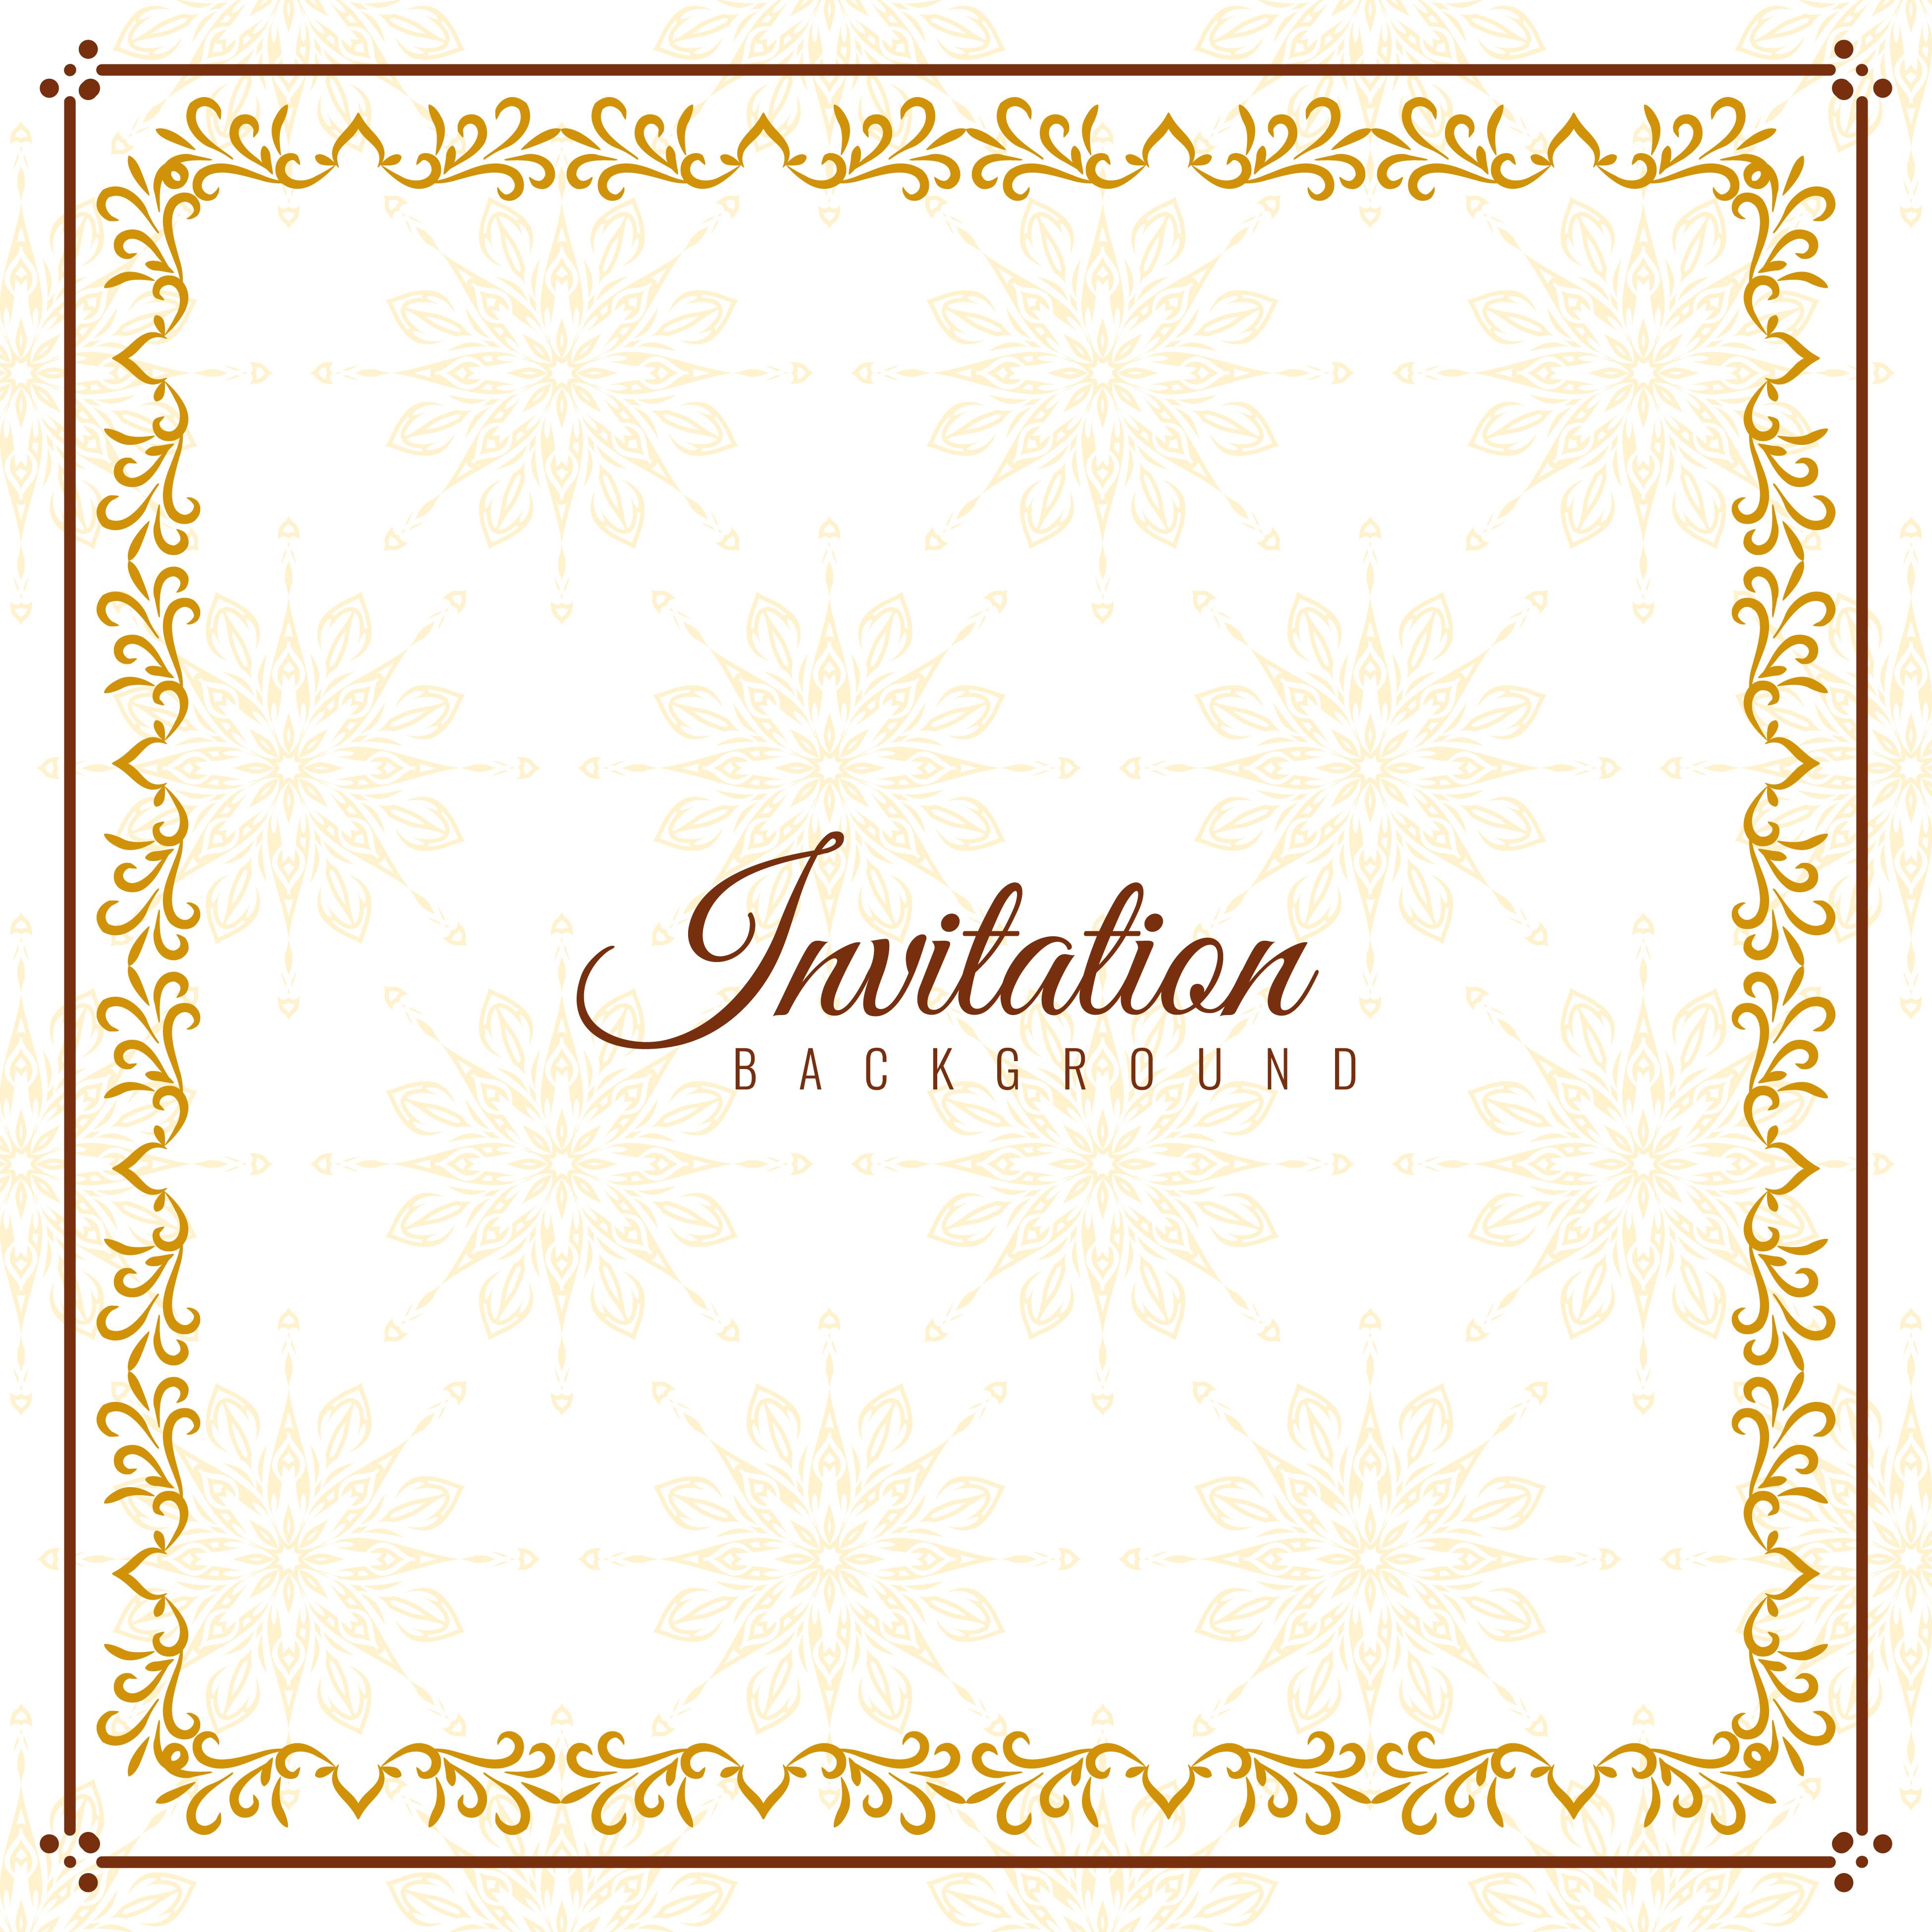 Abstract elegant Invitation background design Download